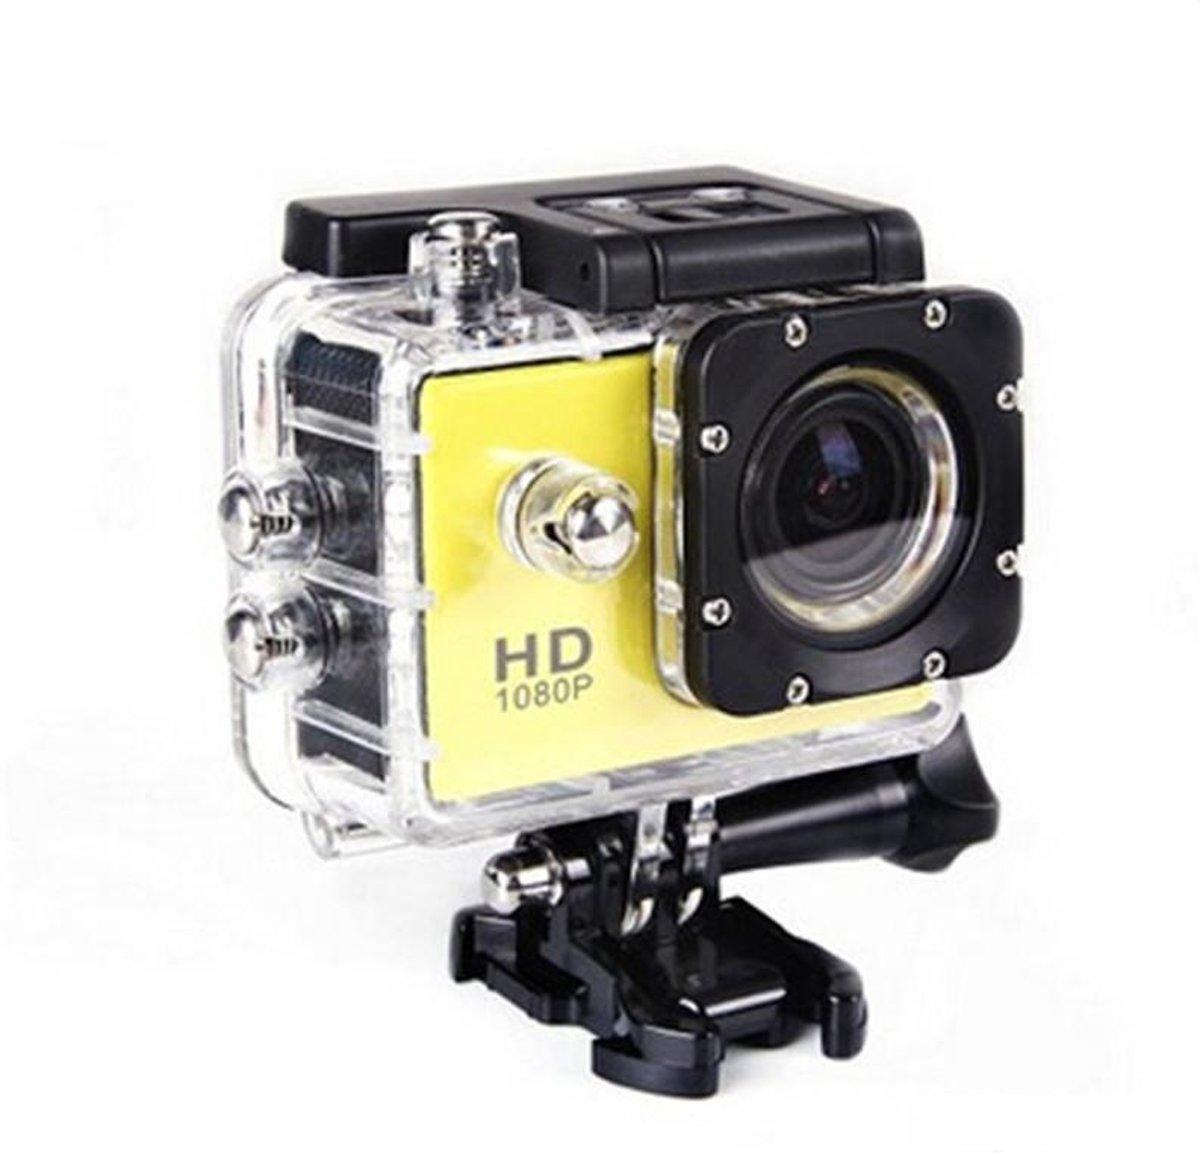 4K Full HD Sport Actie Camera   Action Sports Cam 1080p   2 inch LCD scherm   Onderwater Camera   Waterdicht tot 30 meter   Extreme Sport Camera inclusief accessoires   kleur geel